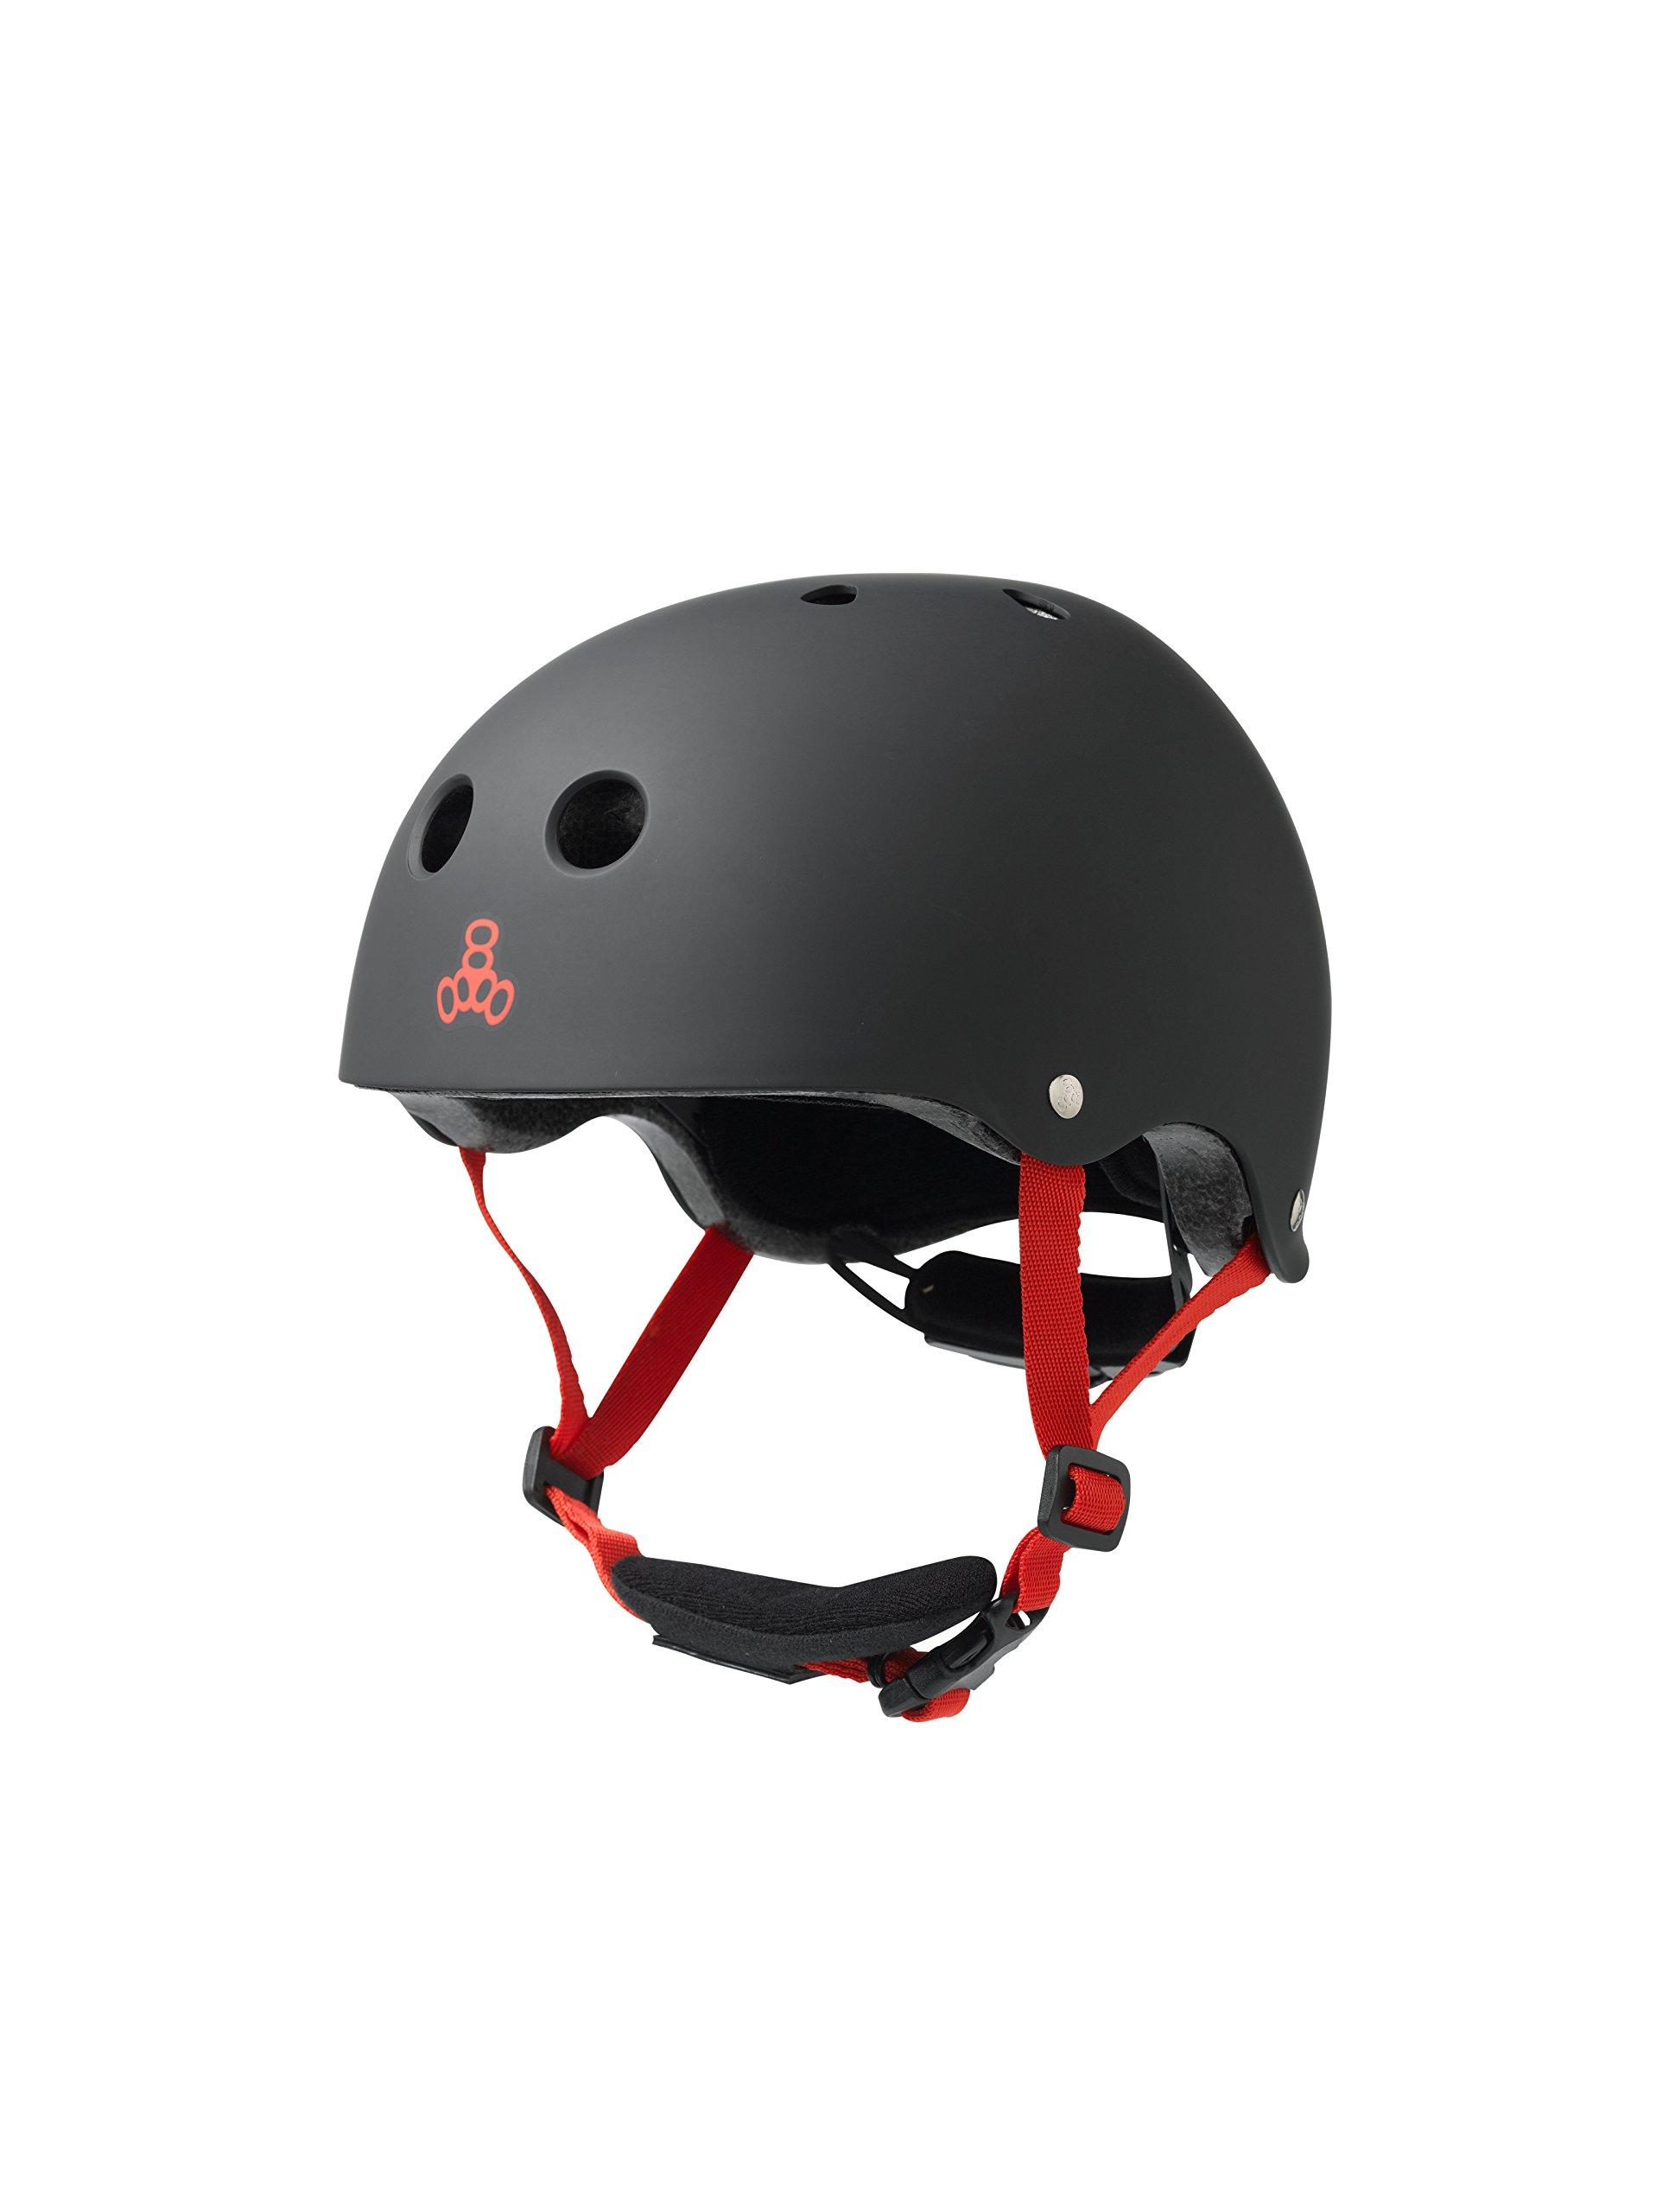 Triple Eight Lil 8 Dual Certified Sweatsaver Kids Skateboard and Bike Helmet with Padded Chin Buckle, Black Rubber